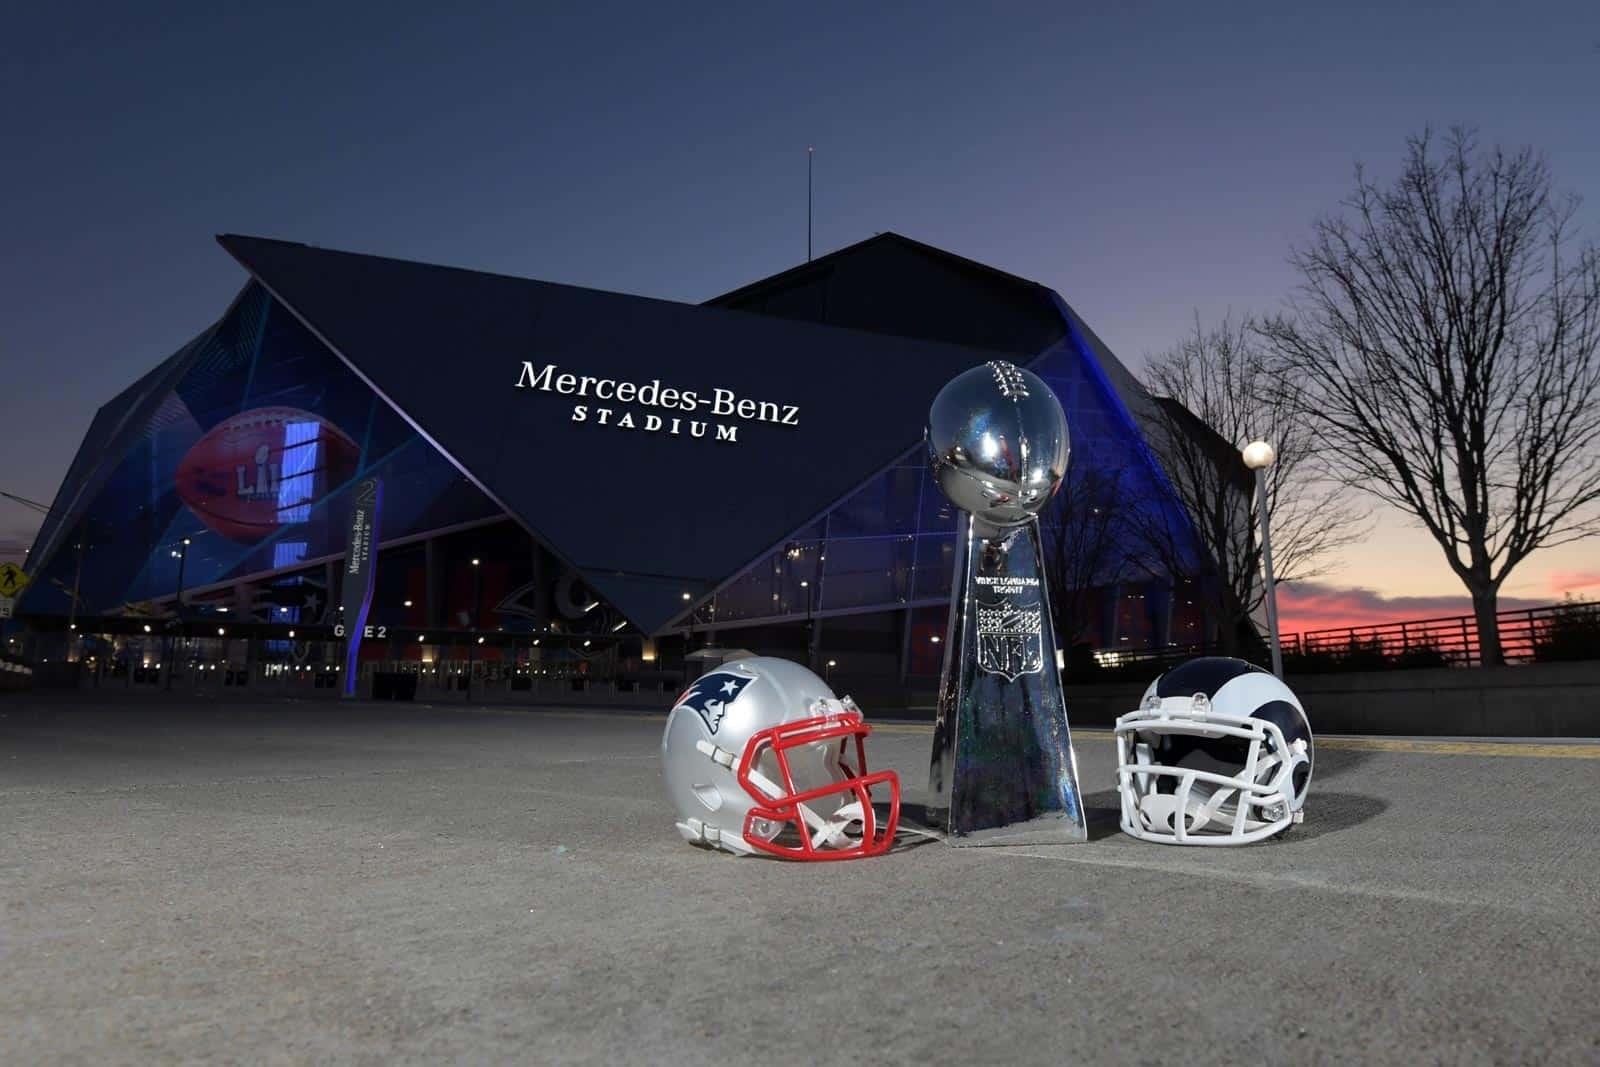 Super Bowl 2019: New England Patriots Vs. Los Angeles Rams in Rams Super Bowl 2019